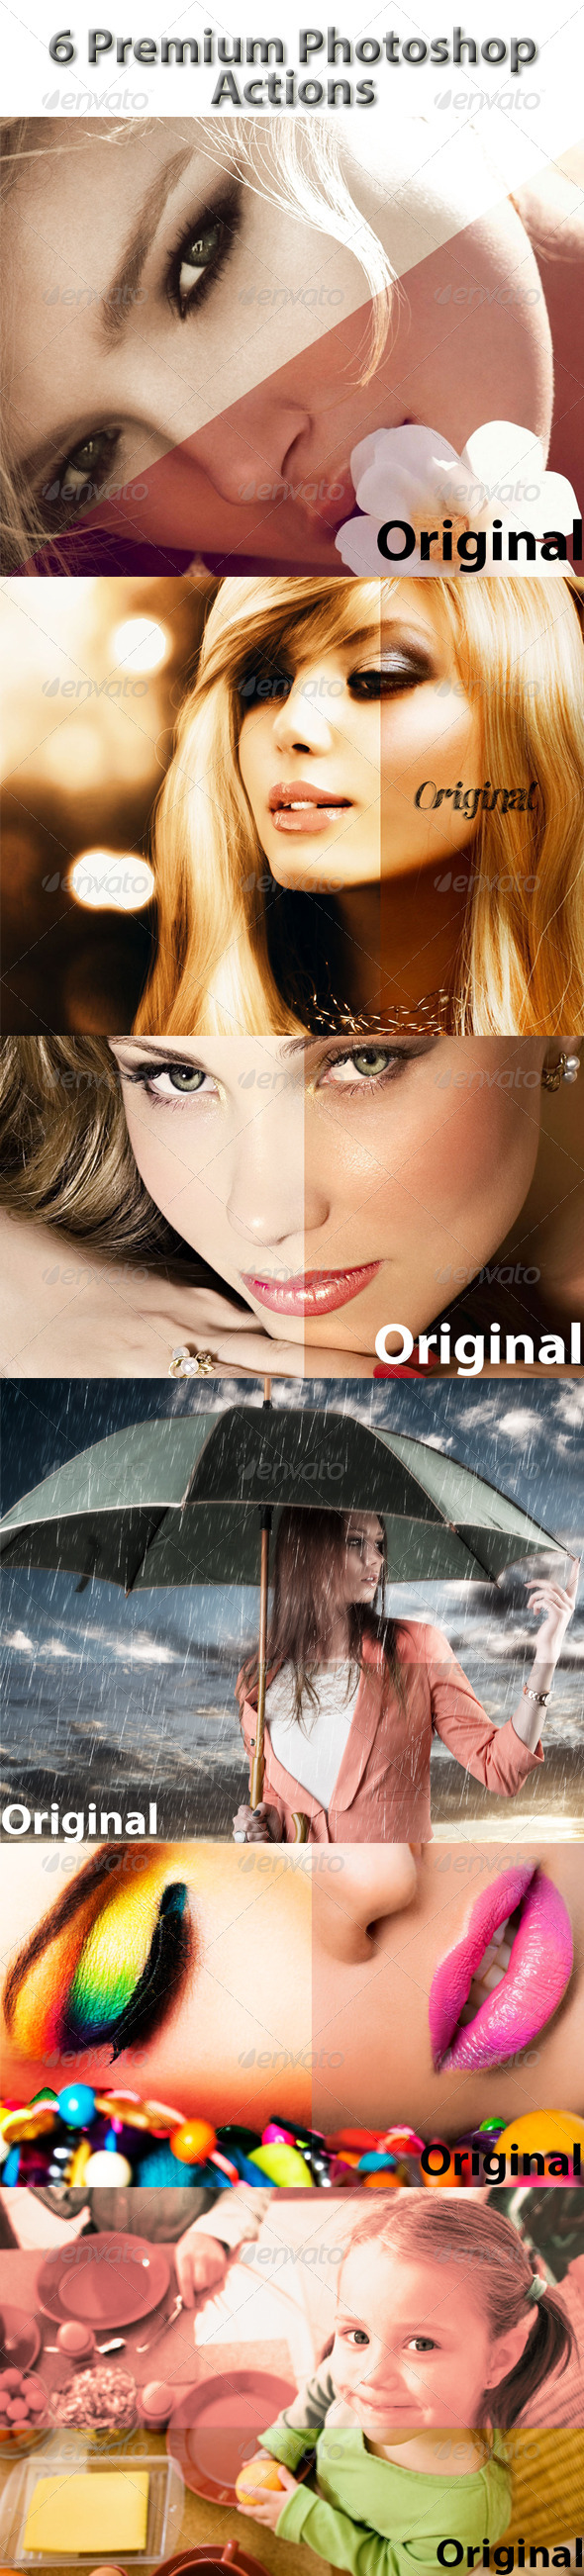 GraphicRiver 6 Premium Photoshop Actions 7680934